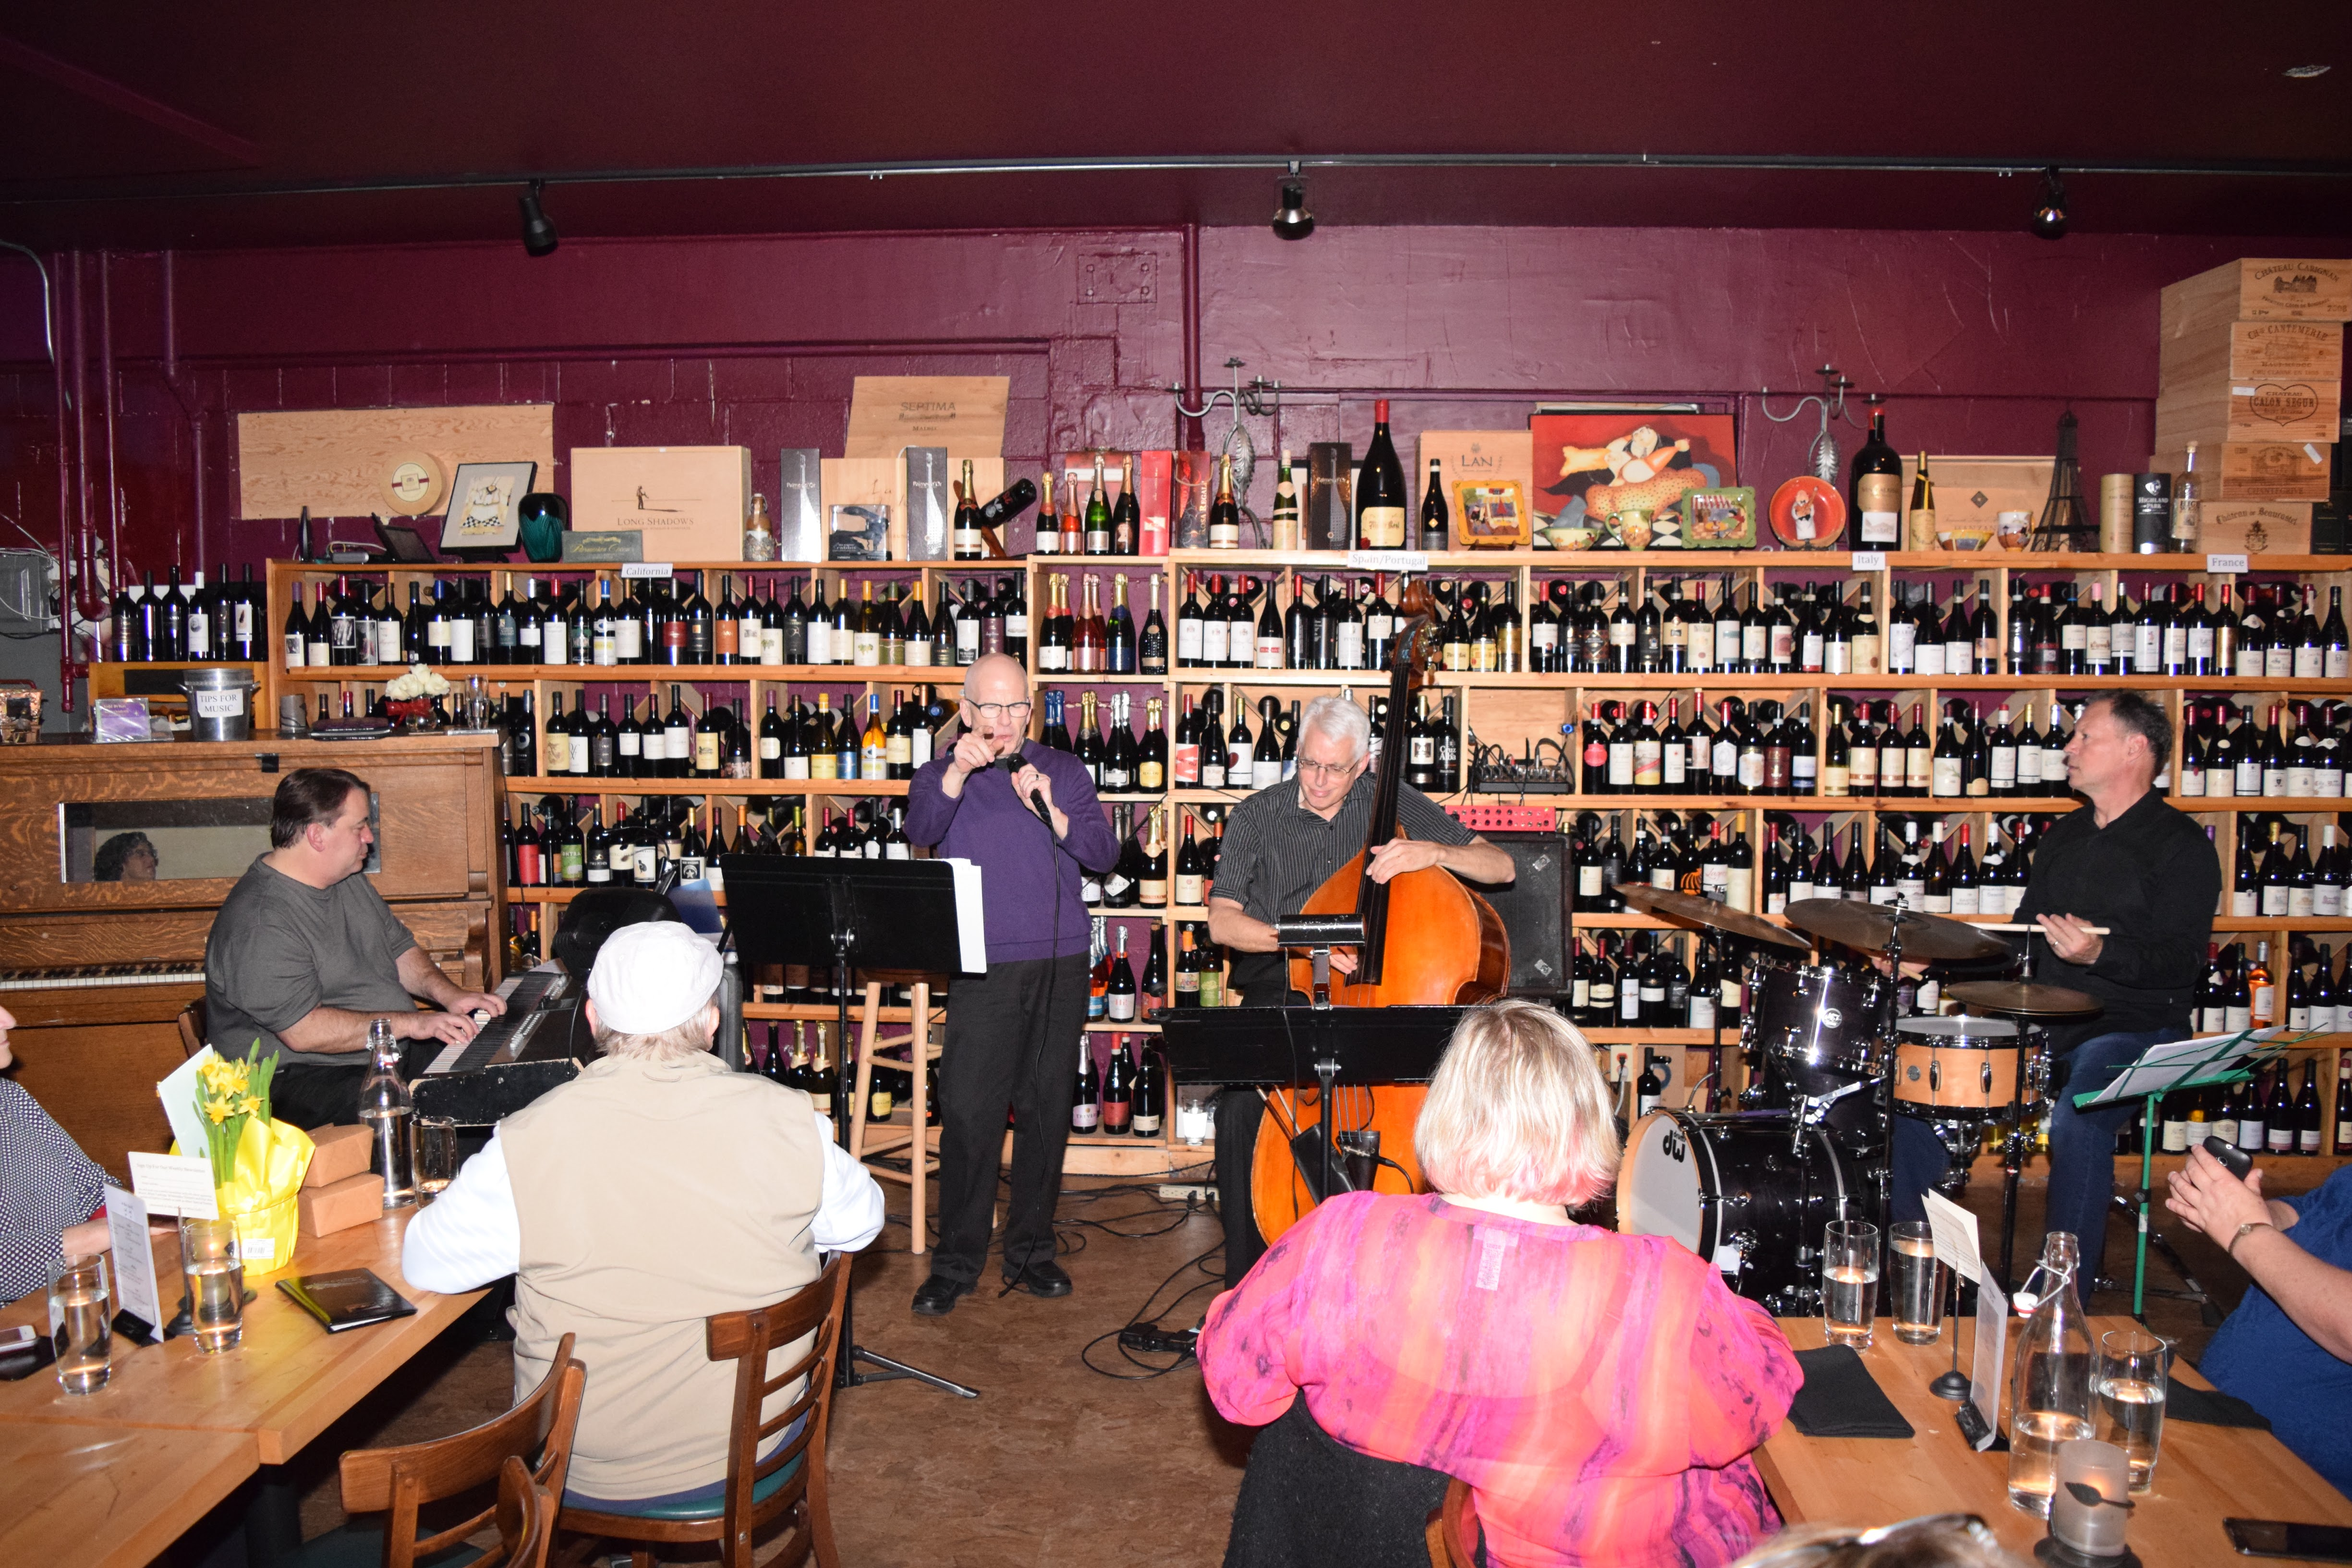 Todd Hymas with the Darin Clendenin Trio